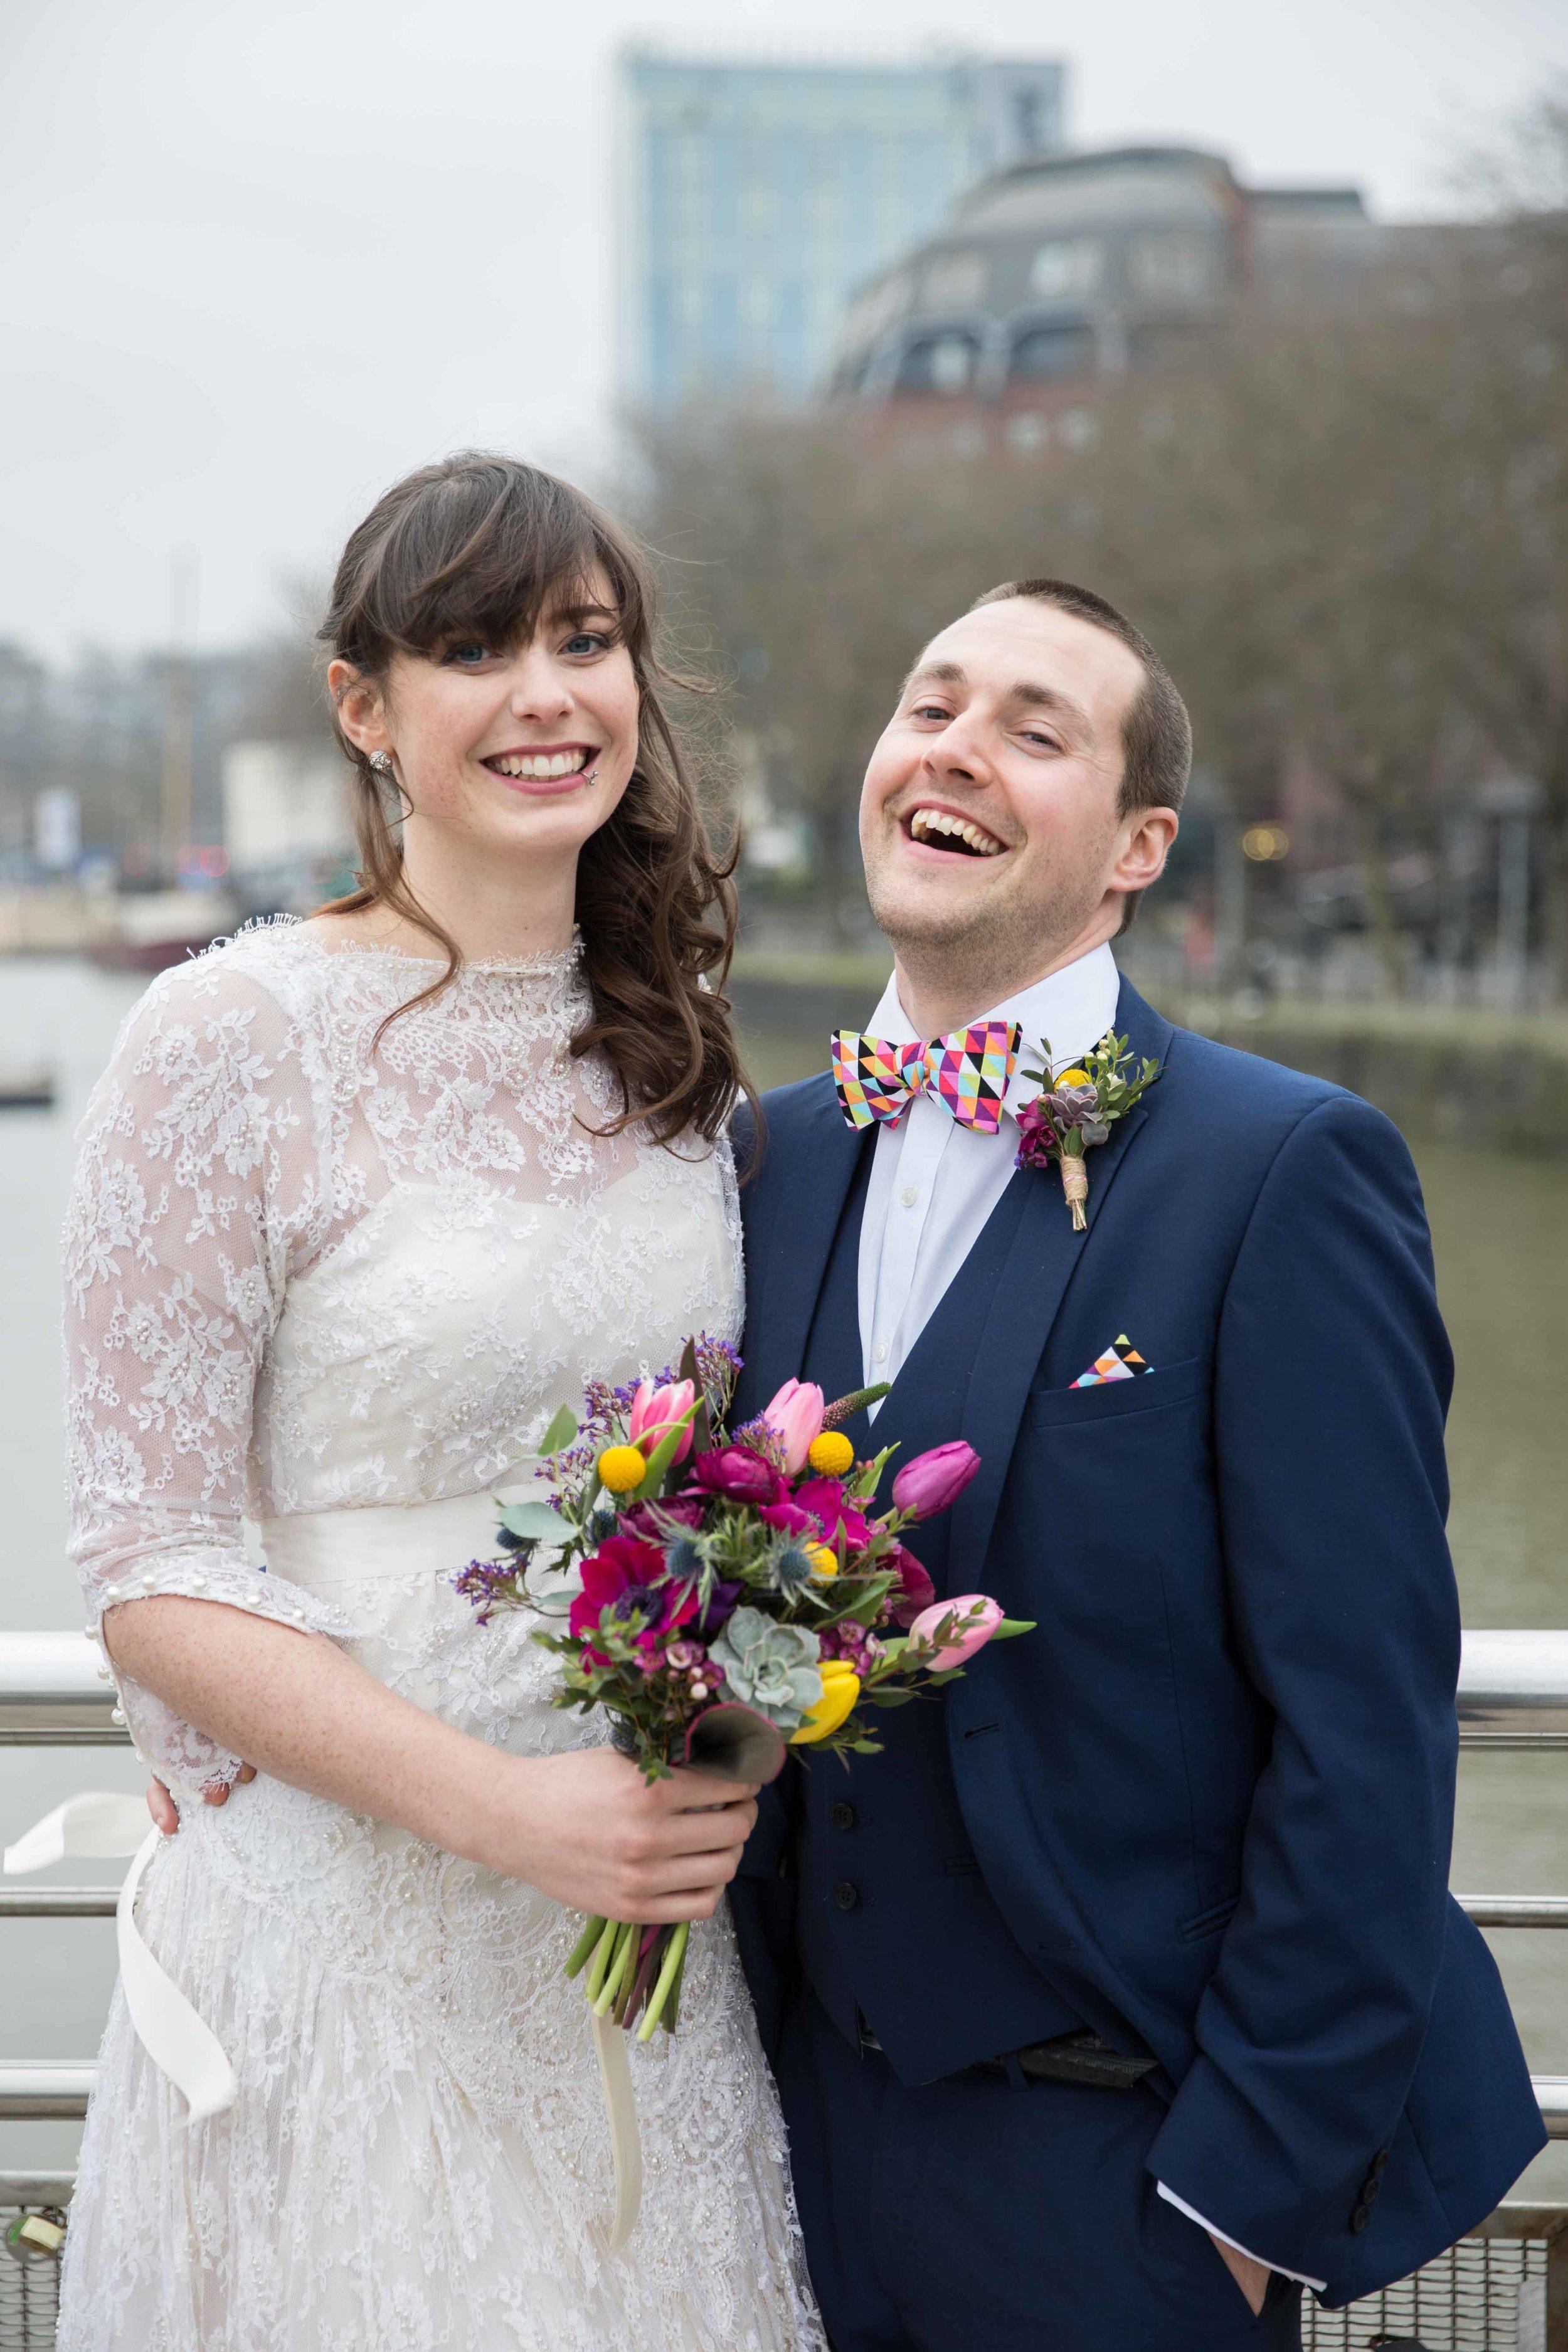 Adam & Faye - Wright Wedding Photography - Bristol Wedding Photographer -243.jpg